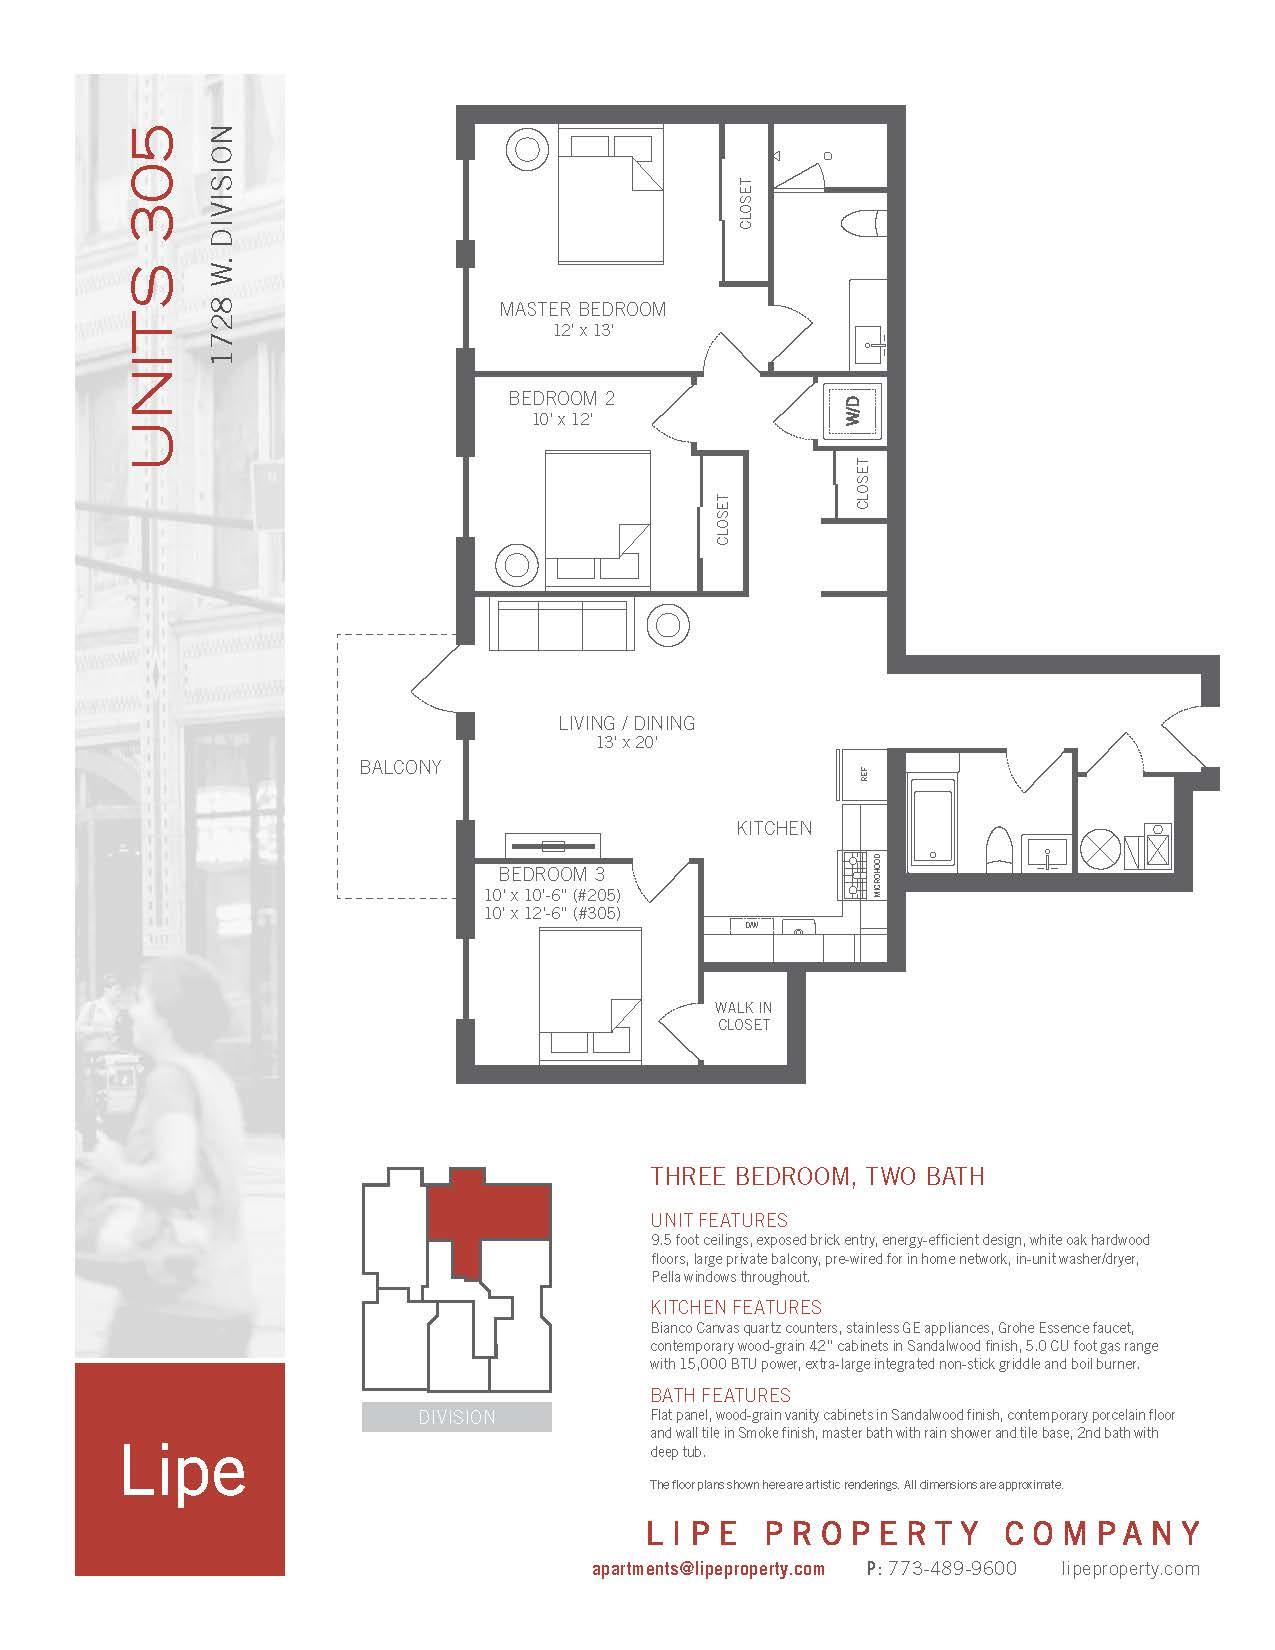 1728-West-Division-305-Floorplan-Chicago-apartment-for-rent.jpg